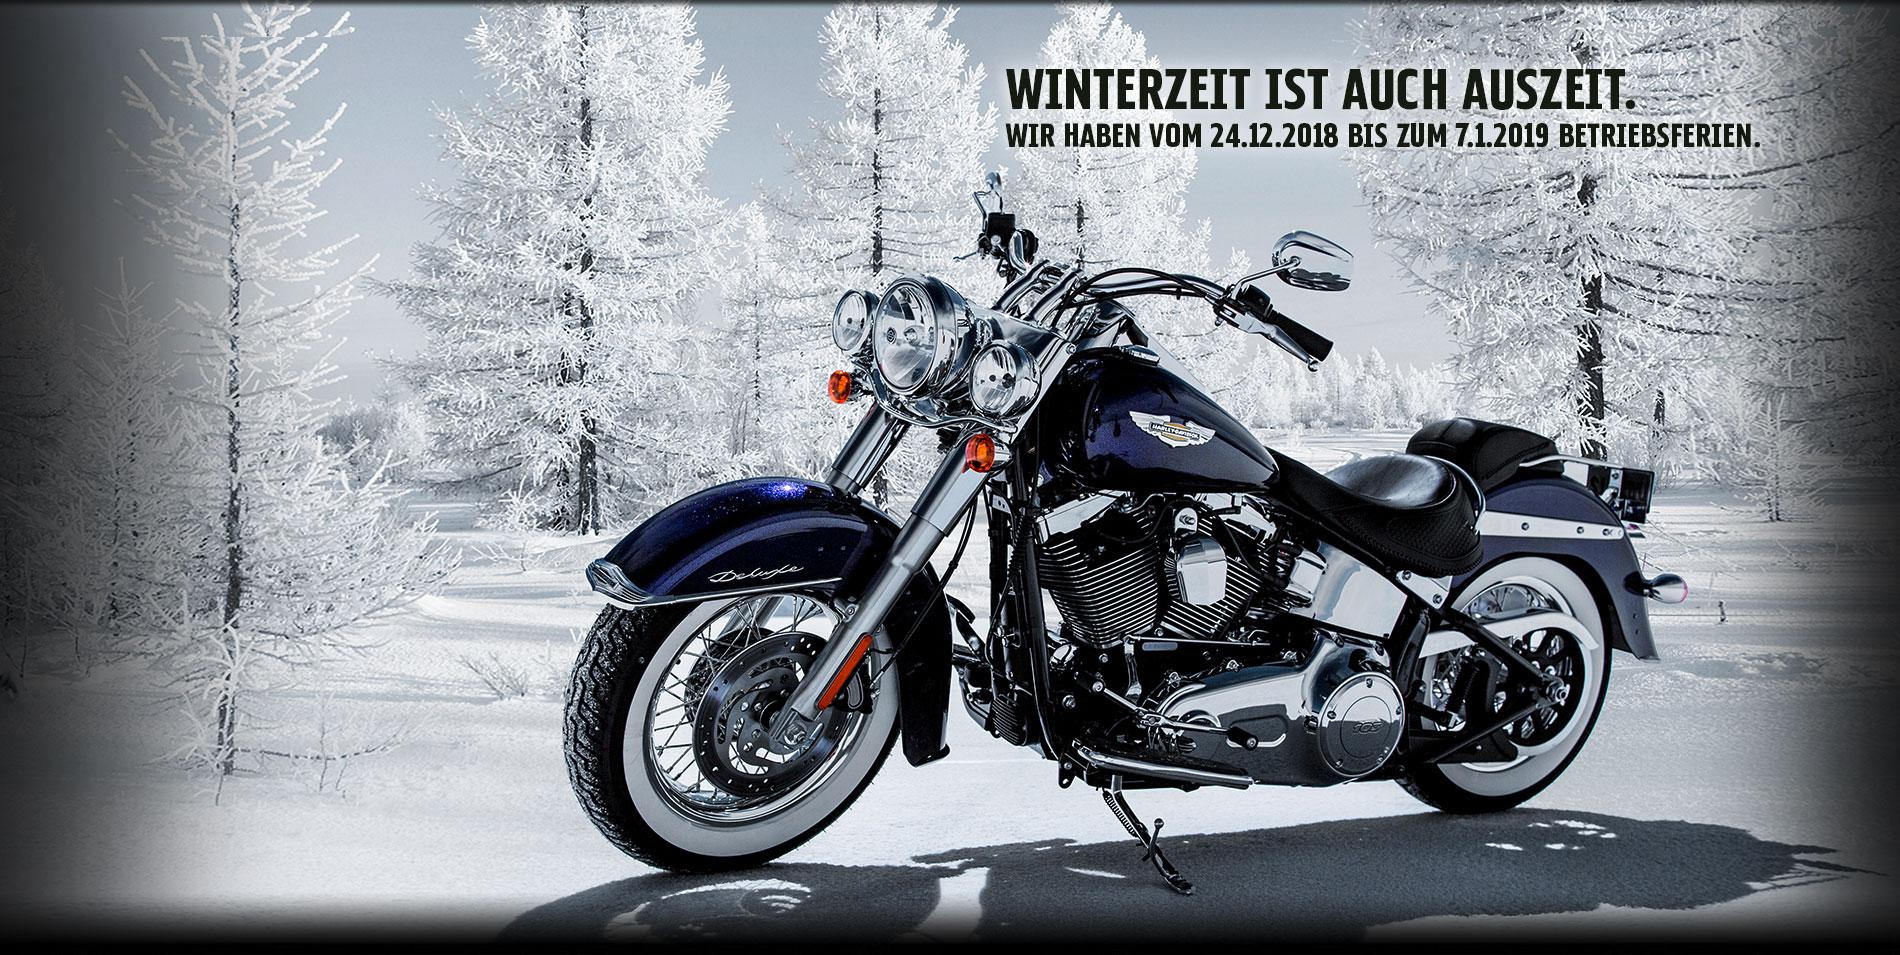 HD_Kassel_Billboard_Winter2018_1900x955